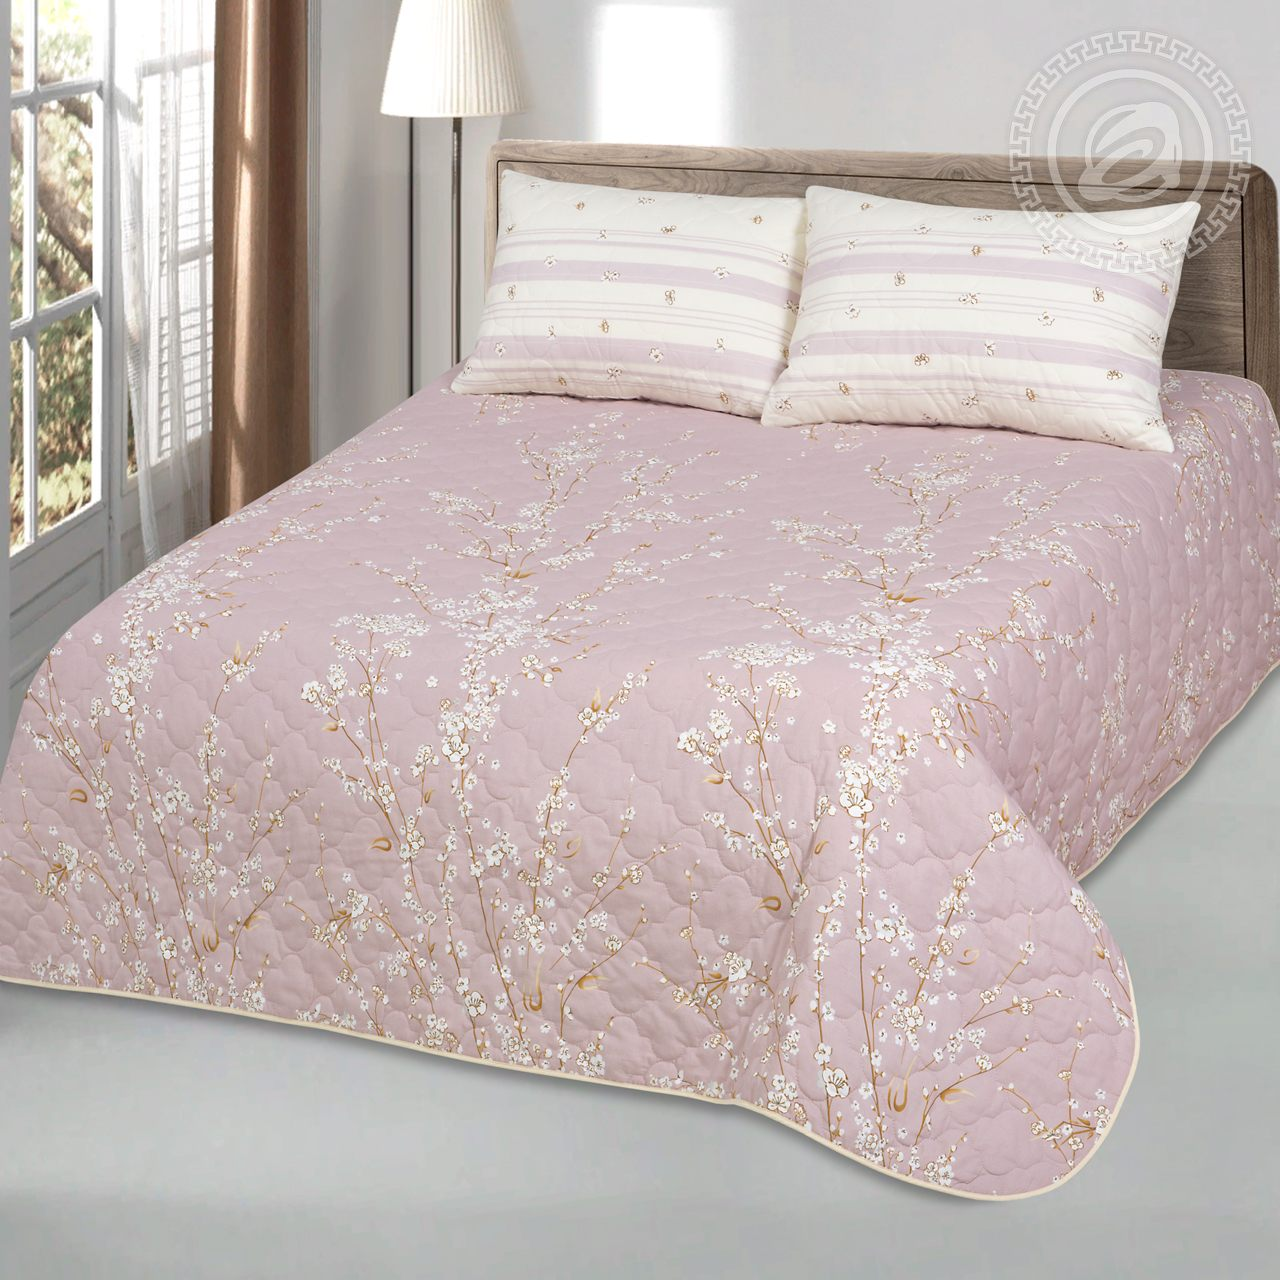 "Покрывало ""Сакура"" Розовый р. 200x215 — Сакура Розовый"